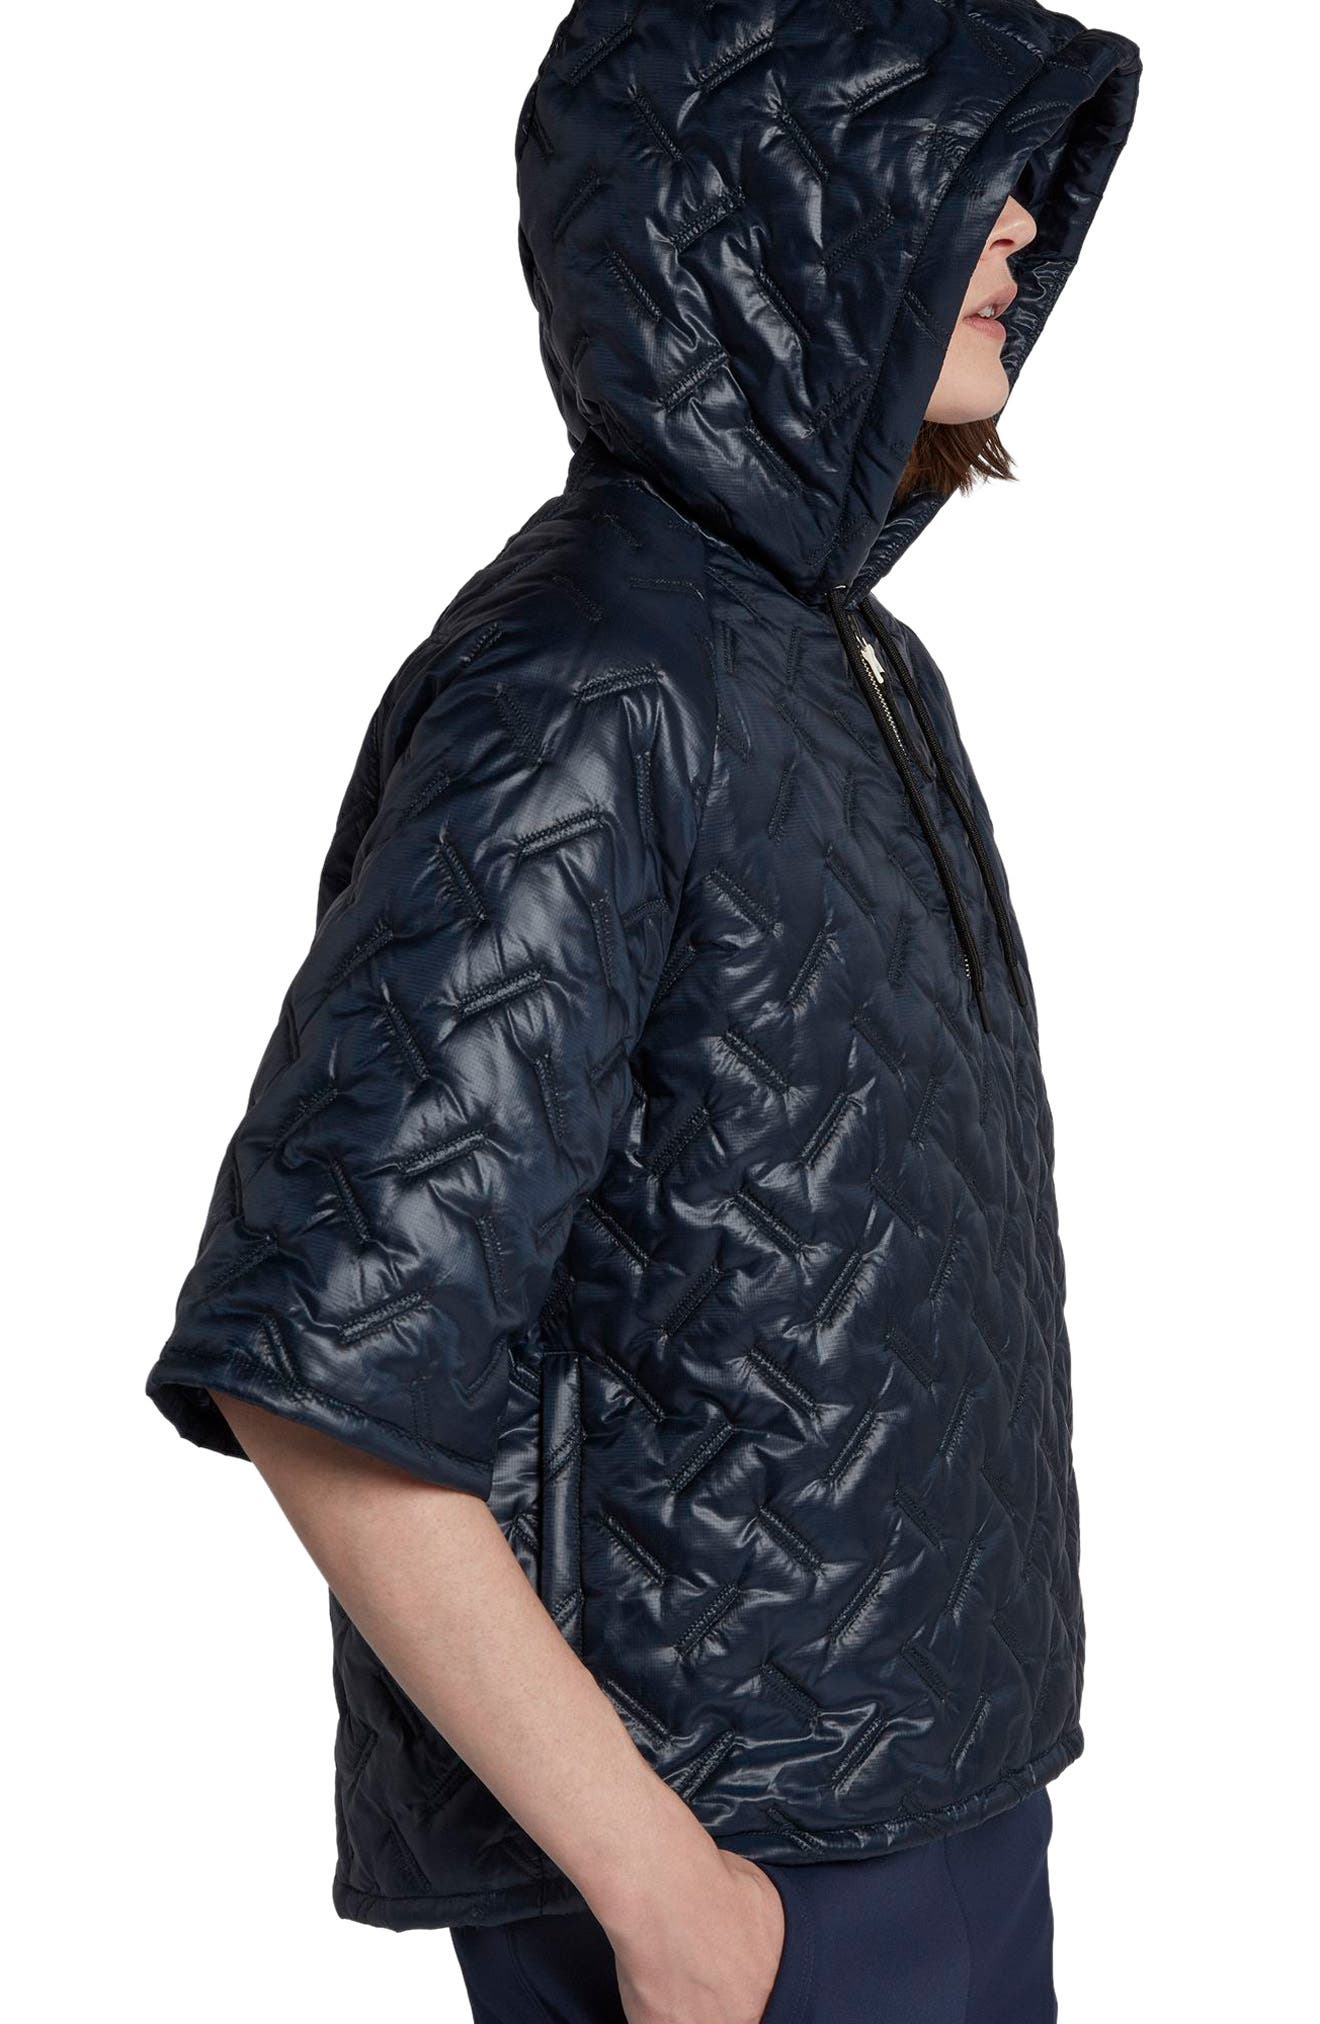 NikeLab Essentials Insulated Short Sleeve Women's Hoodie,                             Alternate thumbnail 10, color,                             Dark Obsidian/ Black